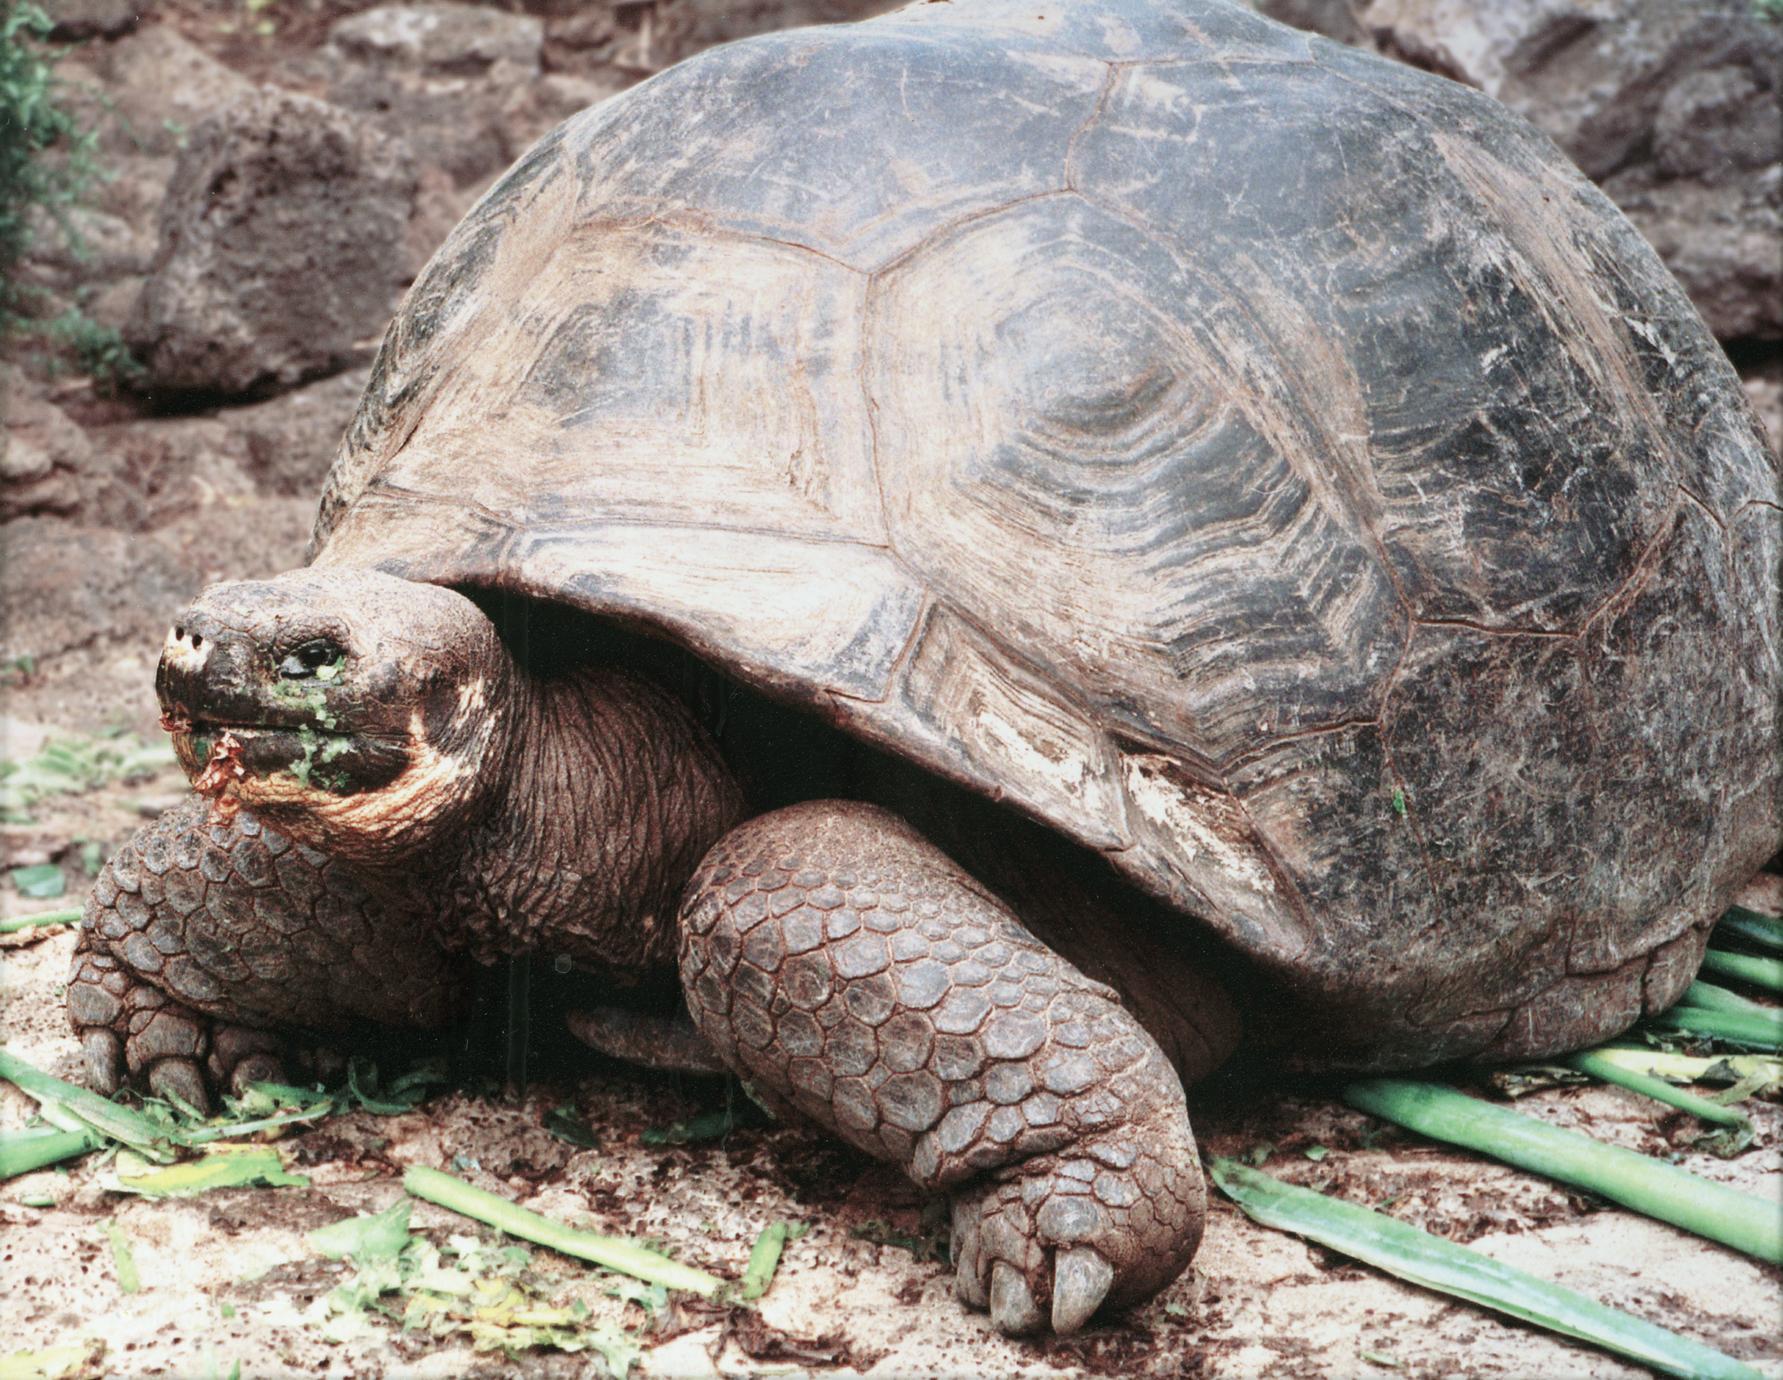 Galápagos Tortoise (Geochelone elephantopus)